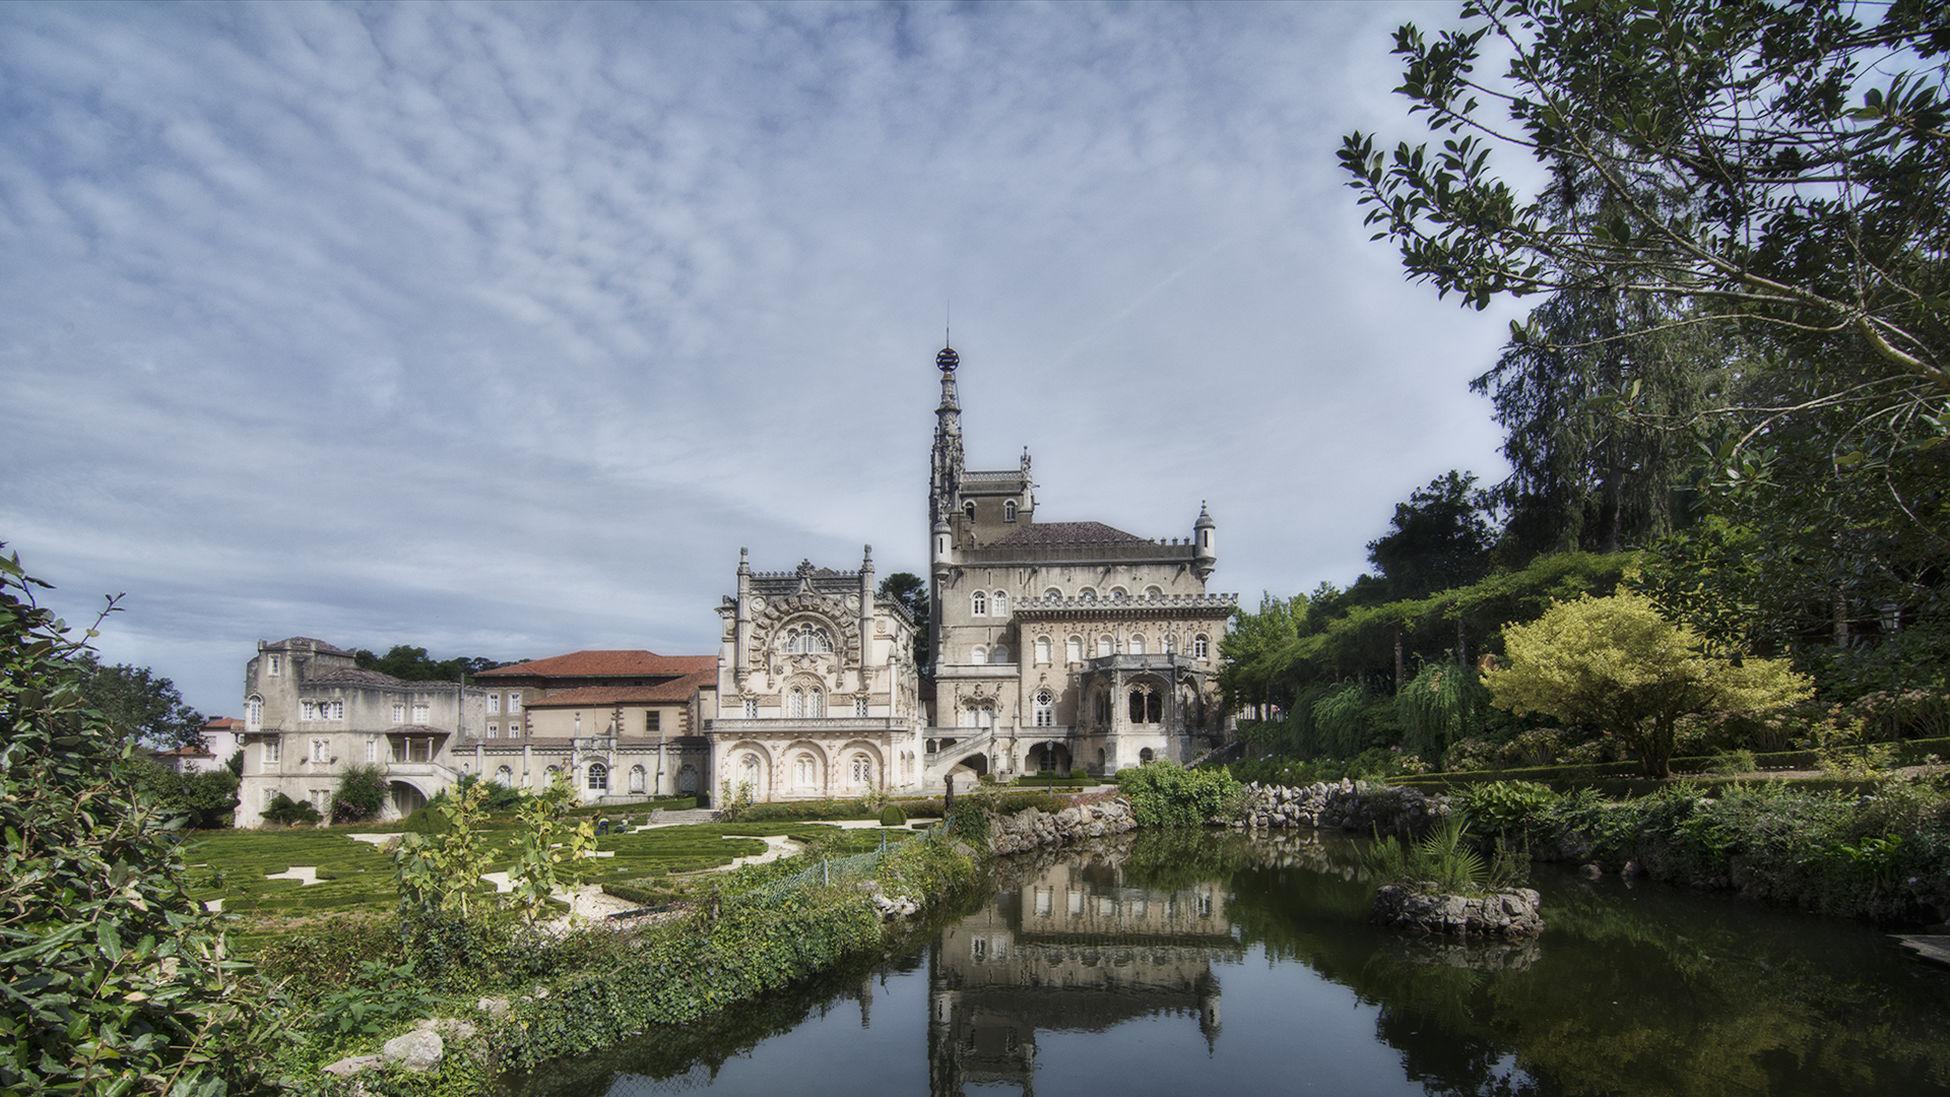 Architecture Built Structure History Nature Palace Hotel Do Bussaco Religion Travel Travel Destinations